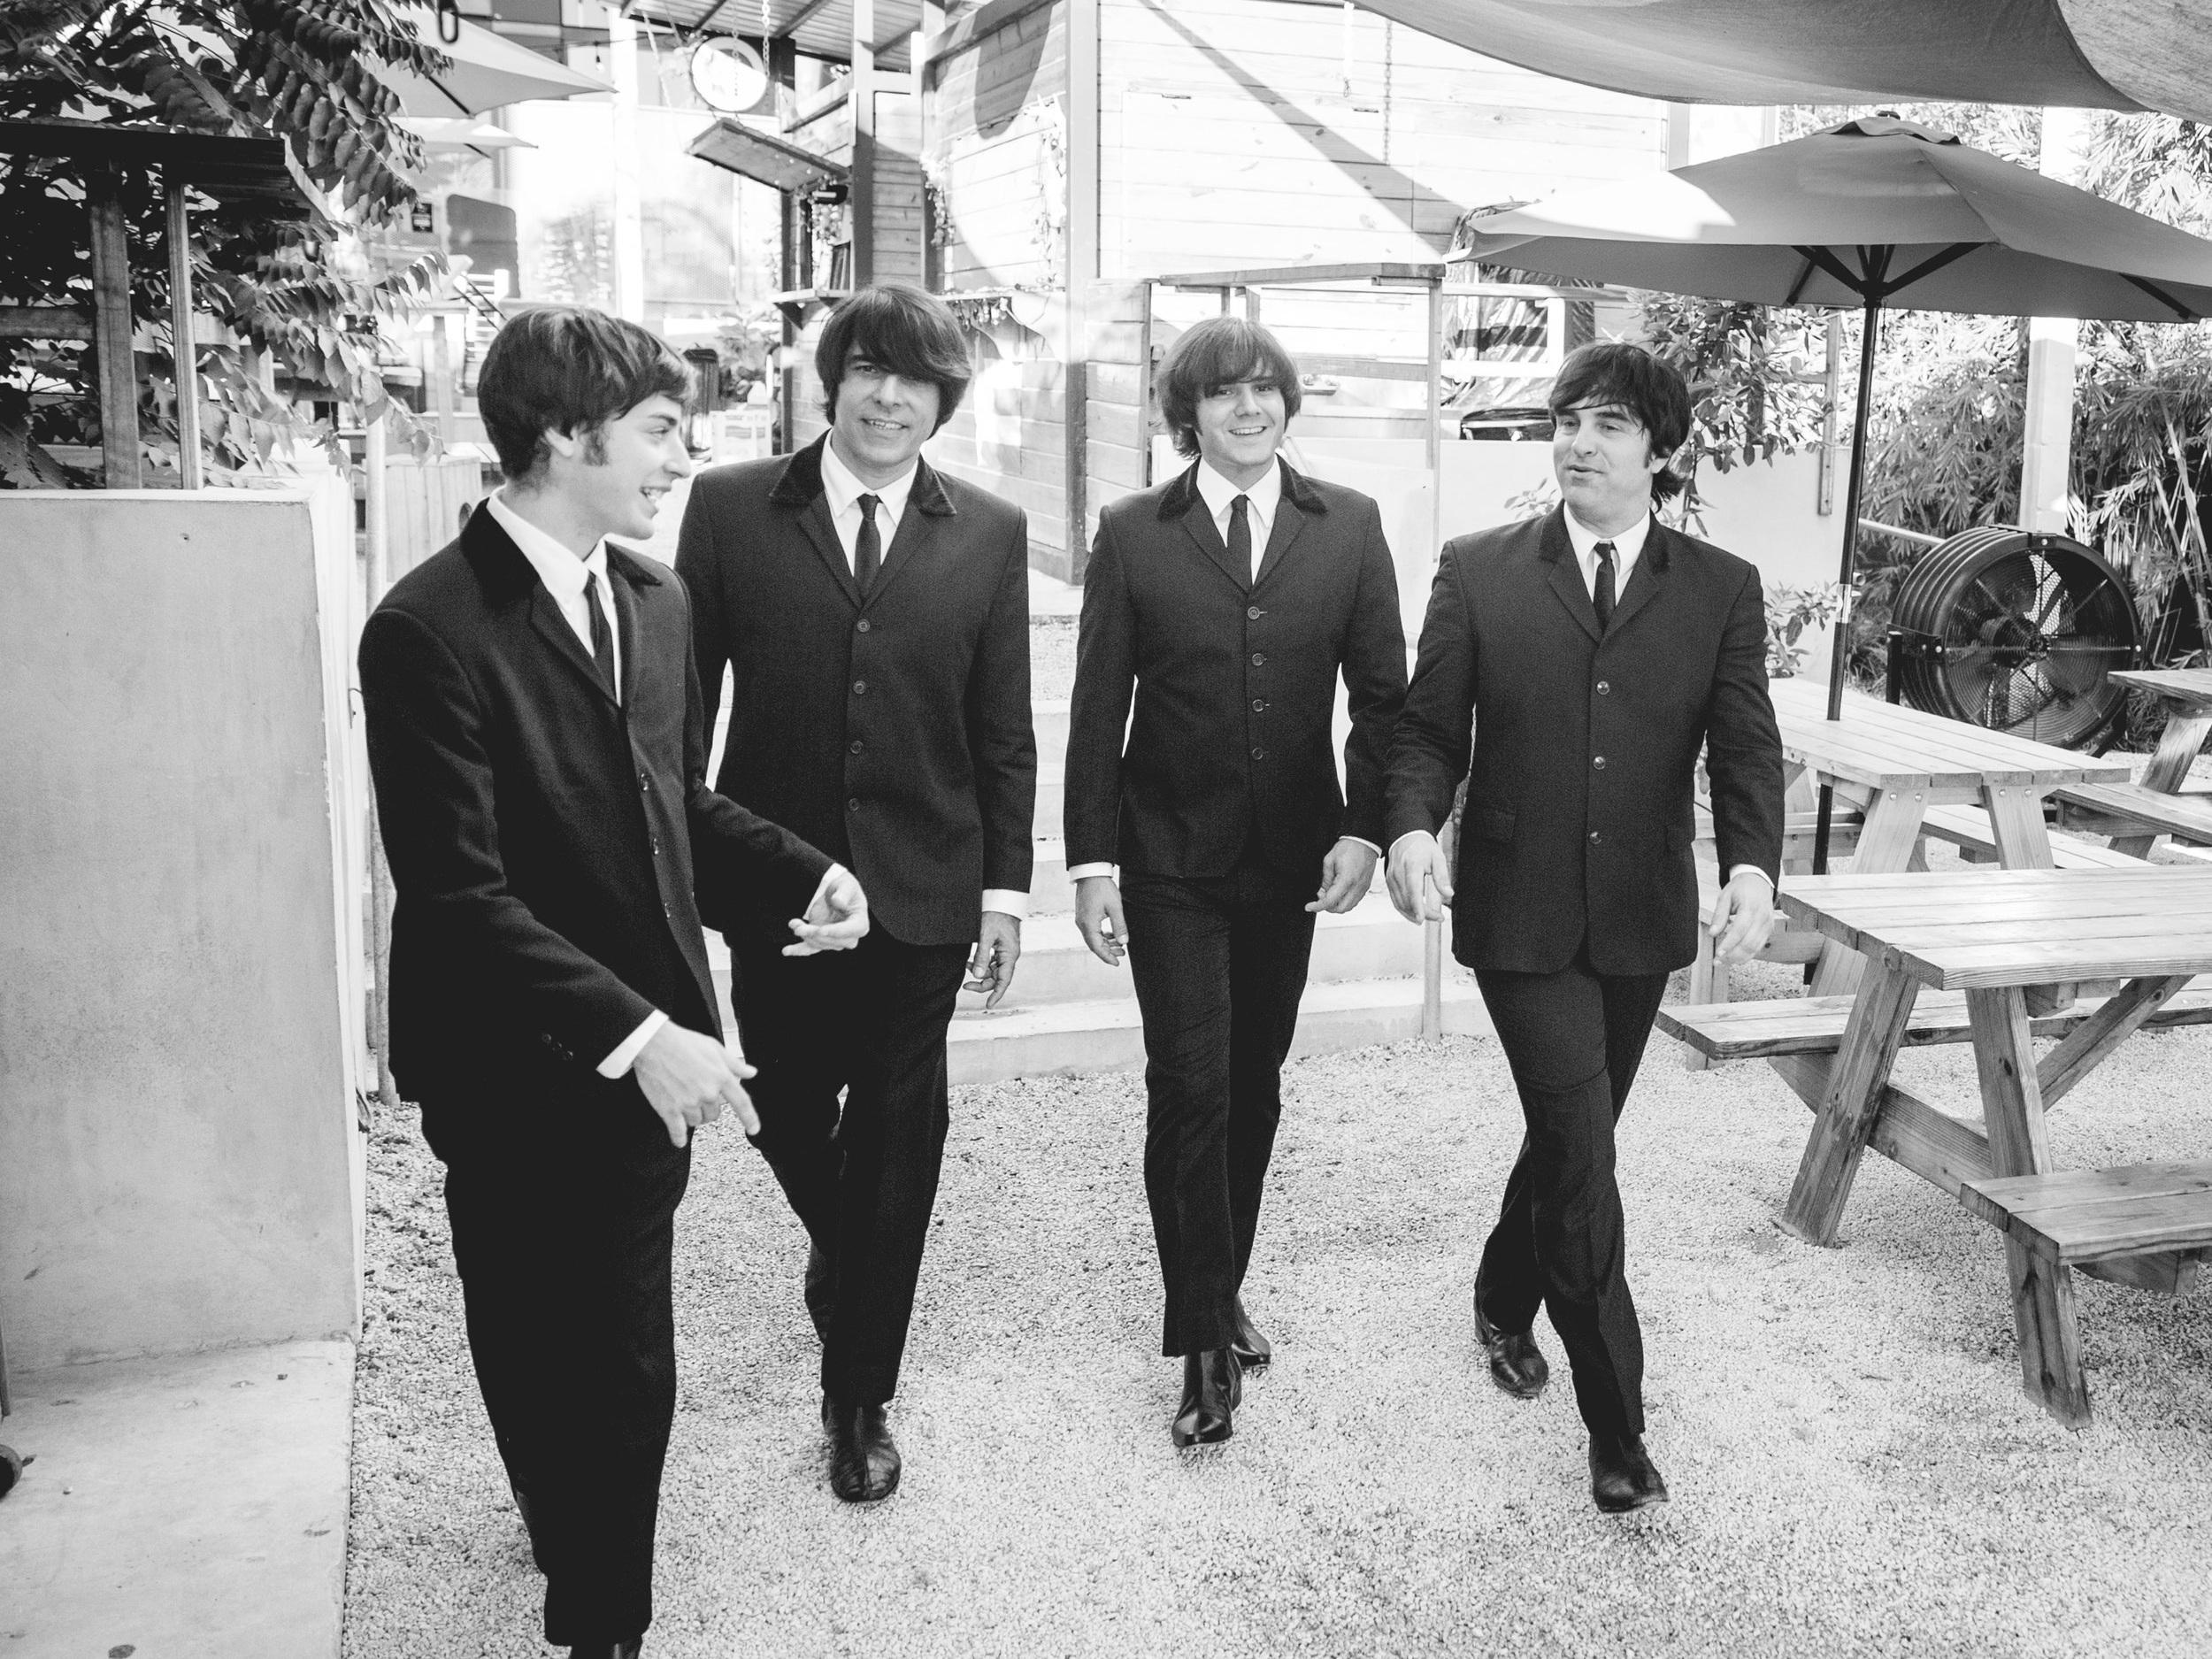 Jukebox Beatles - Since 2005